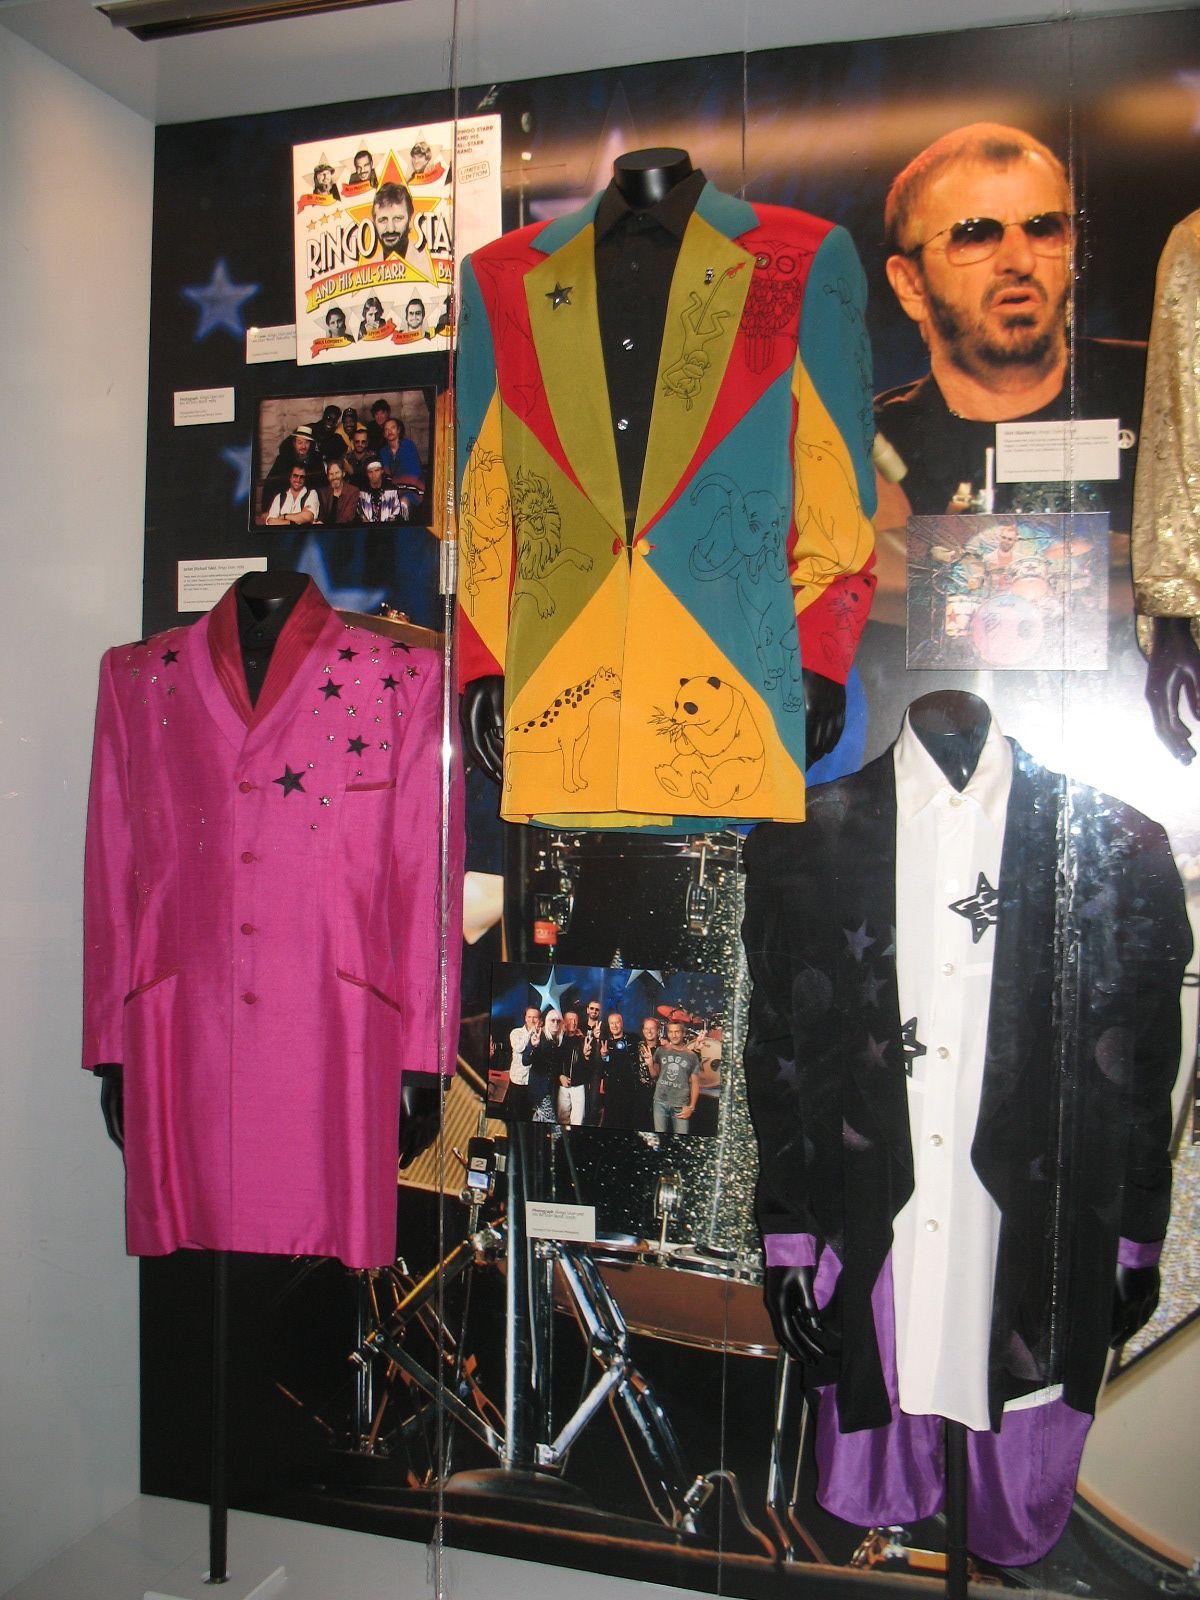 RIngo Starr - Grammy Museum Exhibit